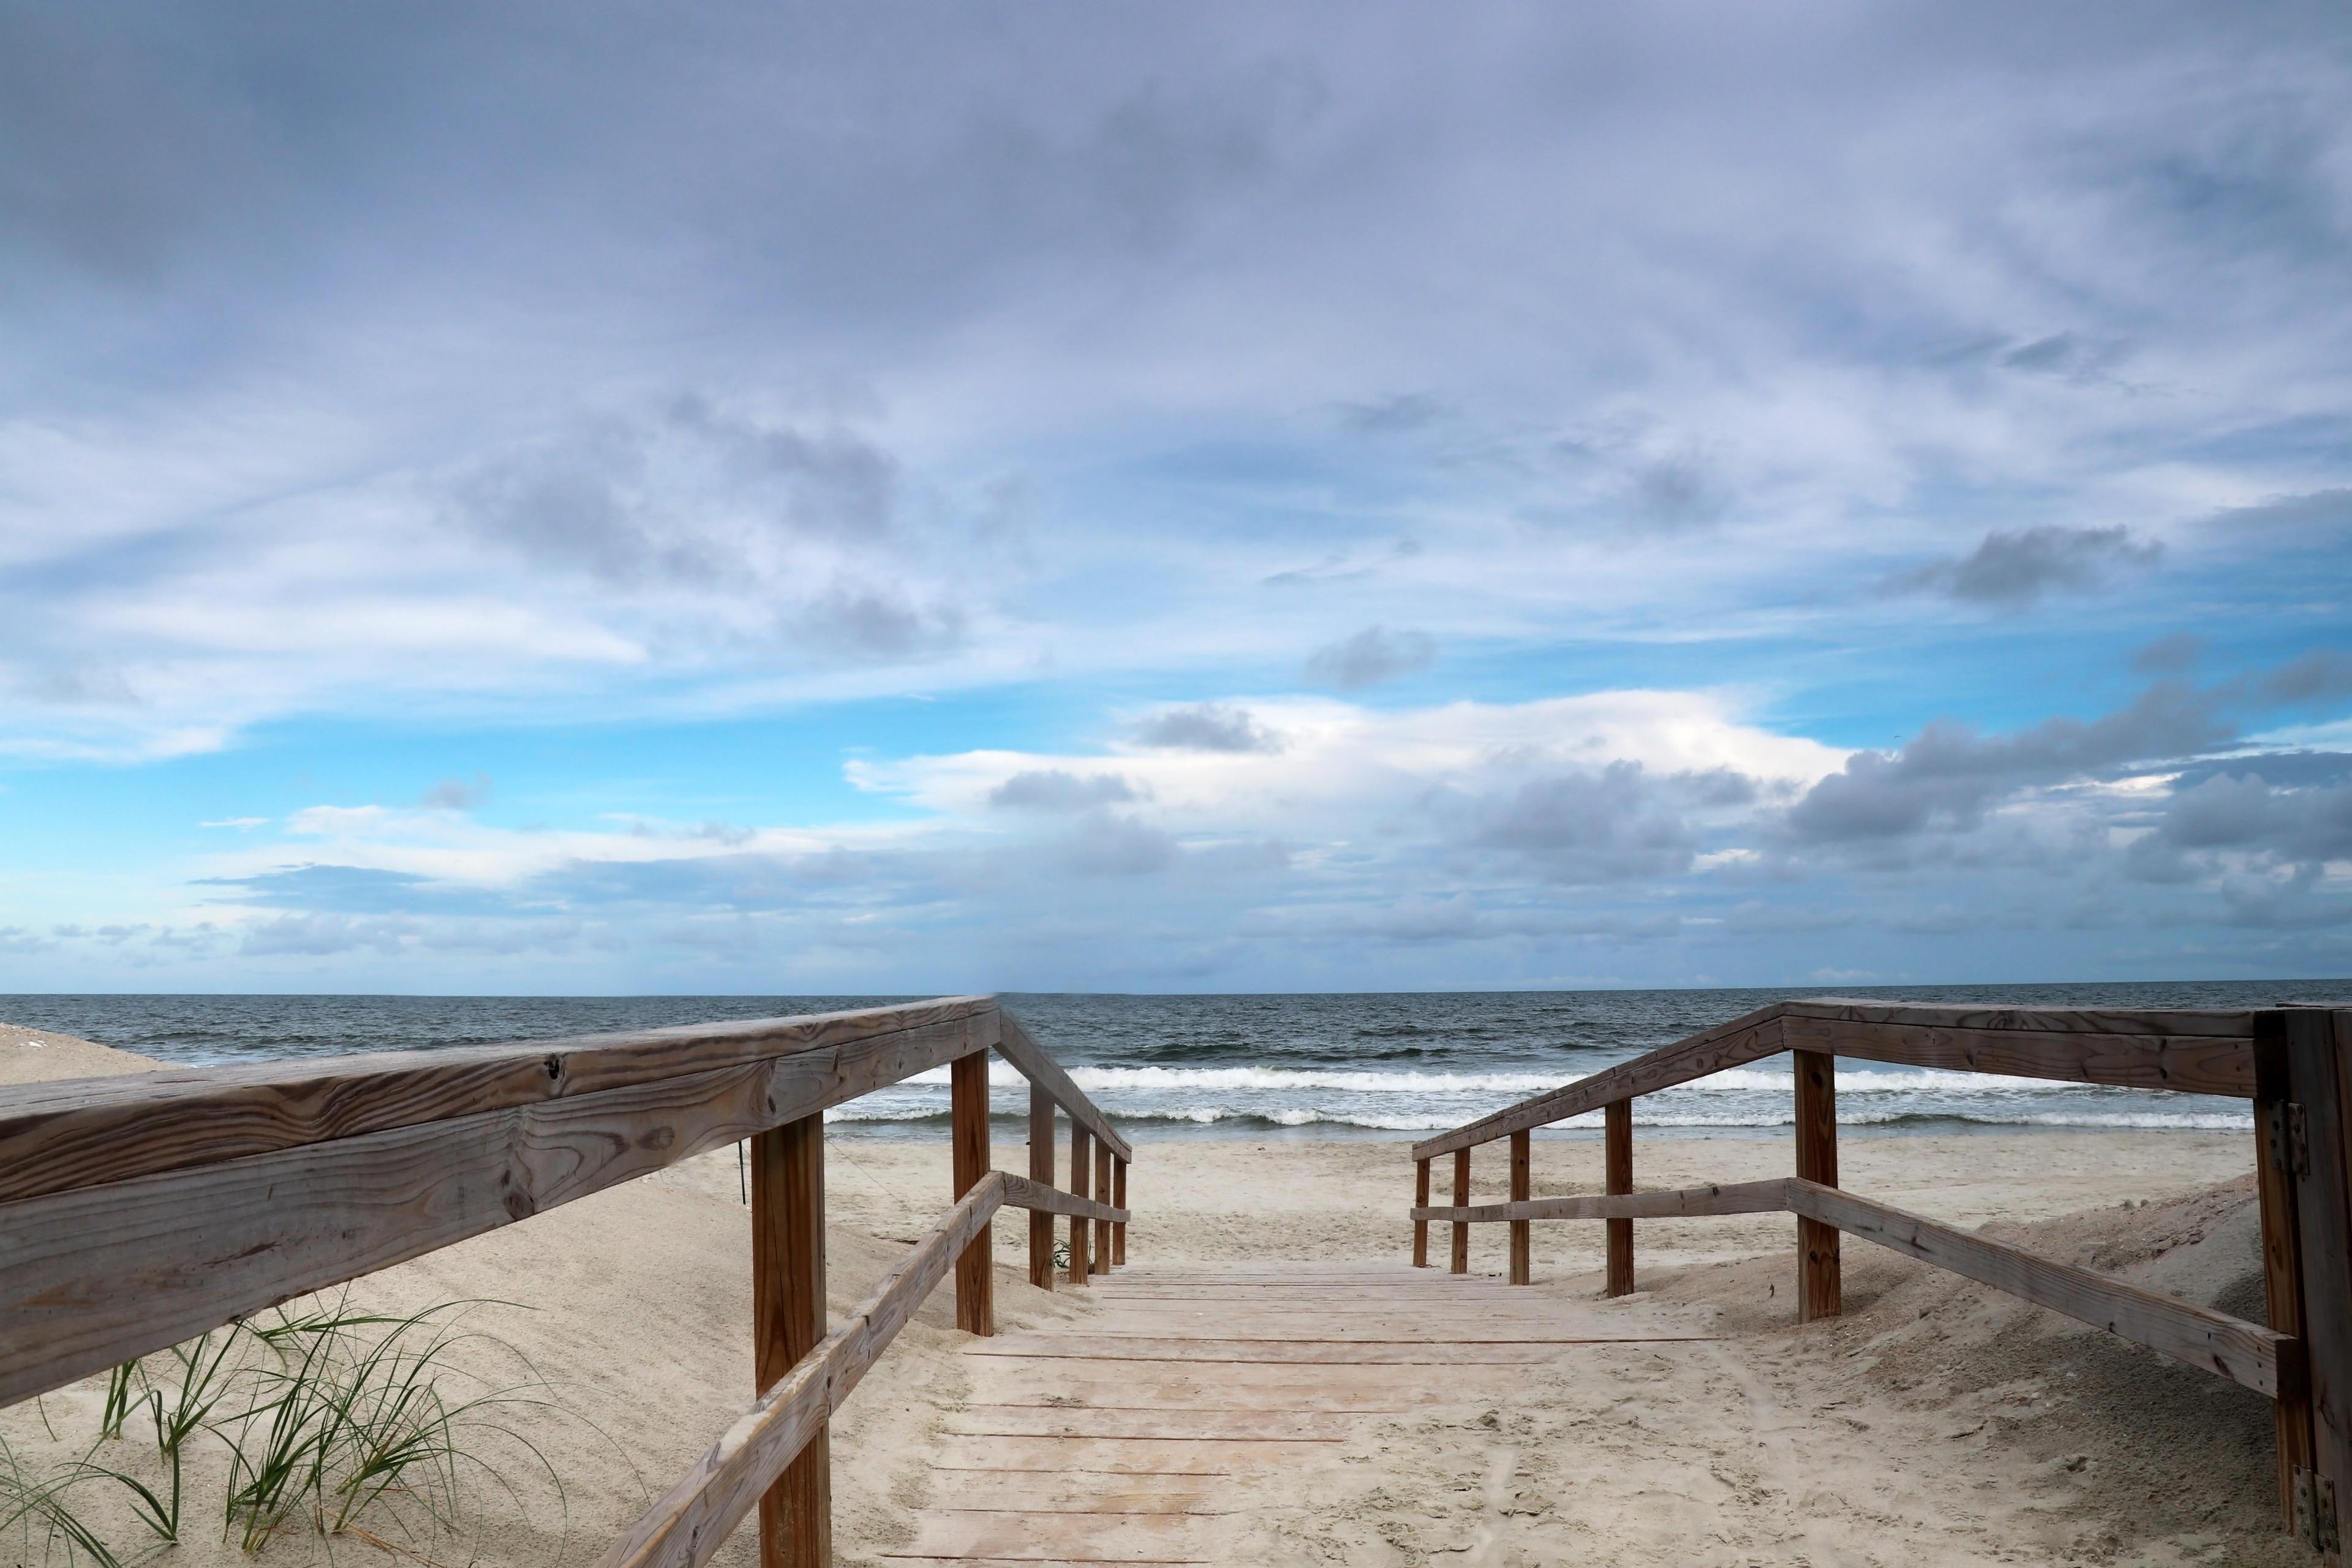 Pawleys Island, South Carolina, USA